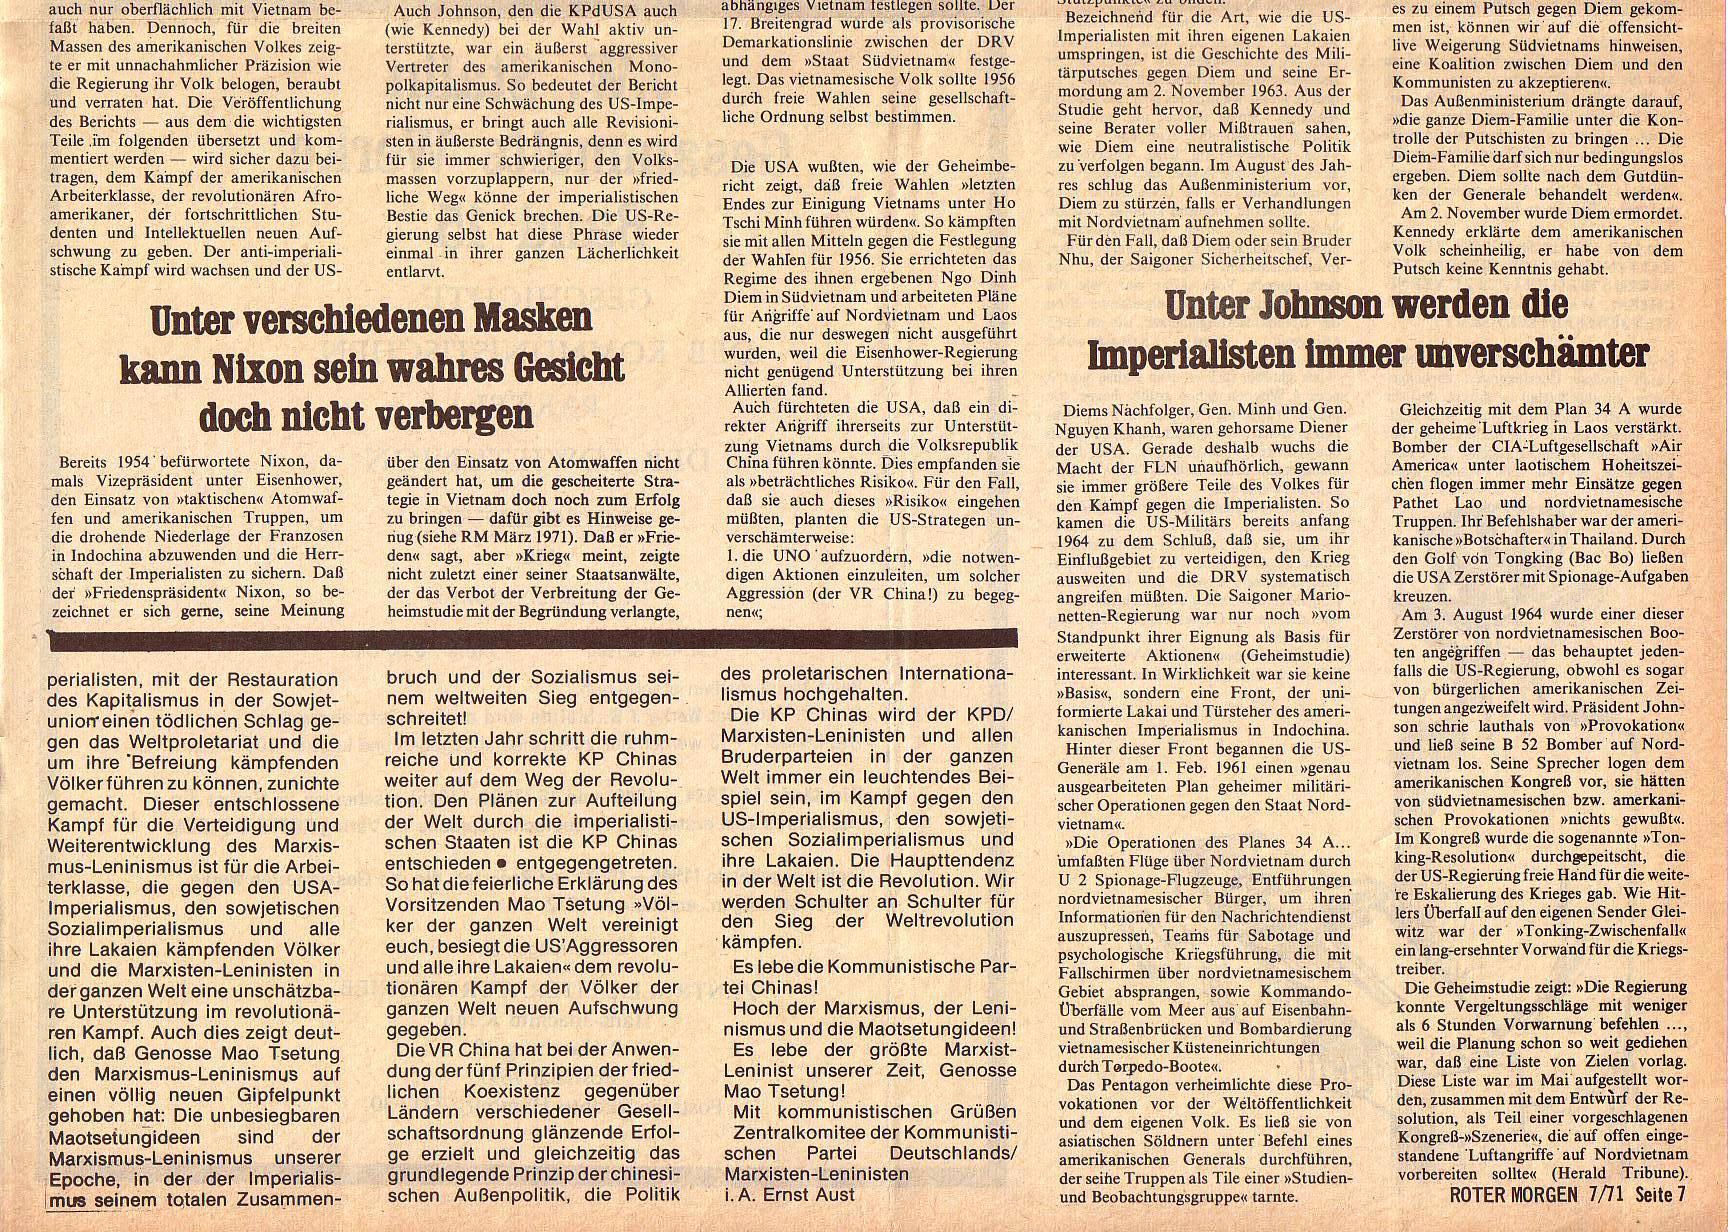 Roter Morgen, 5. Jg., Juli 1971, Nr. 7, Seite 7b